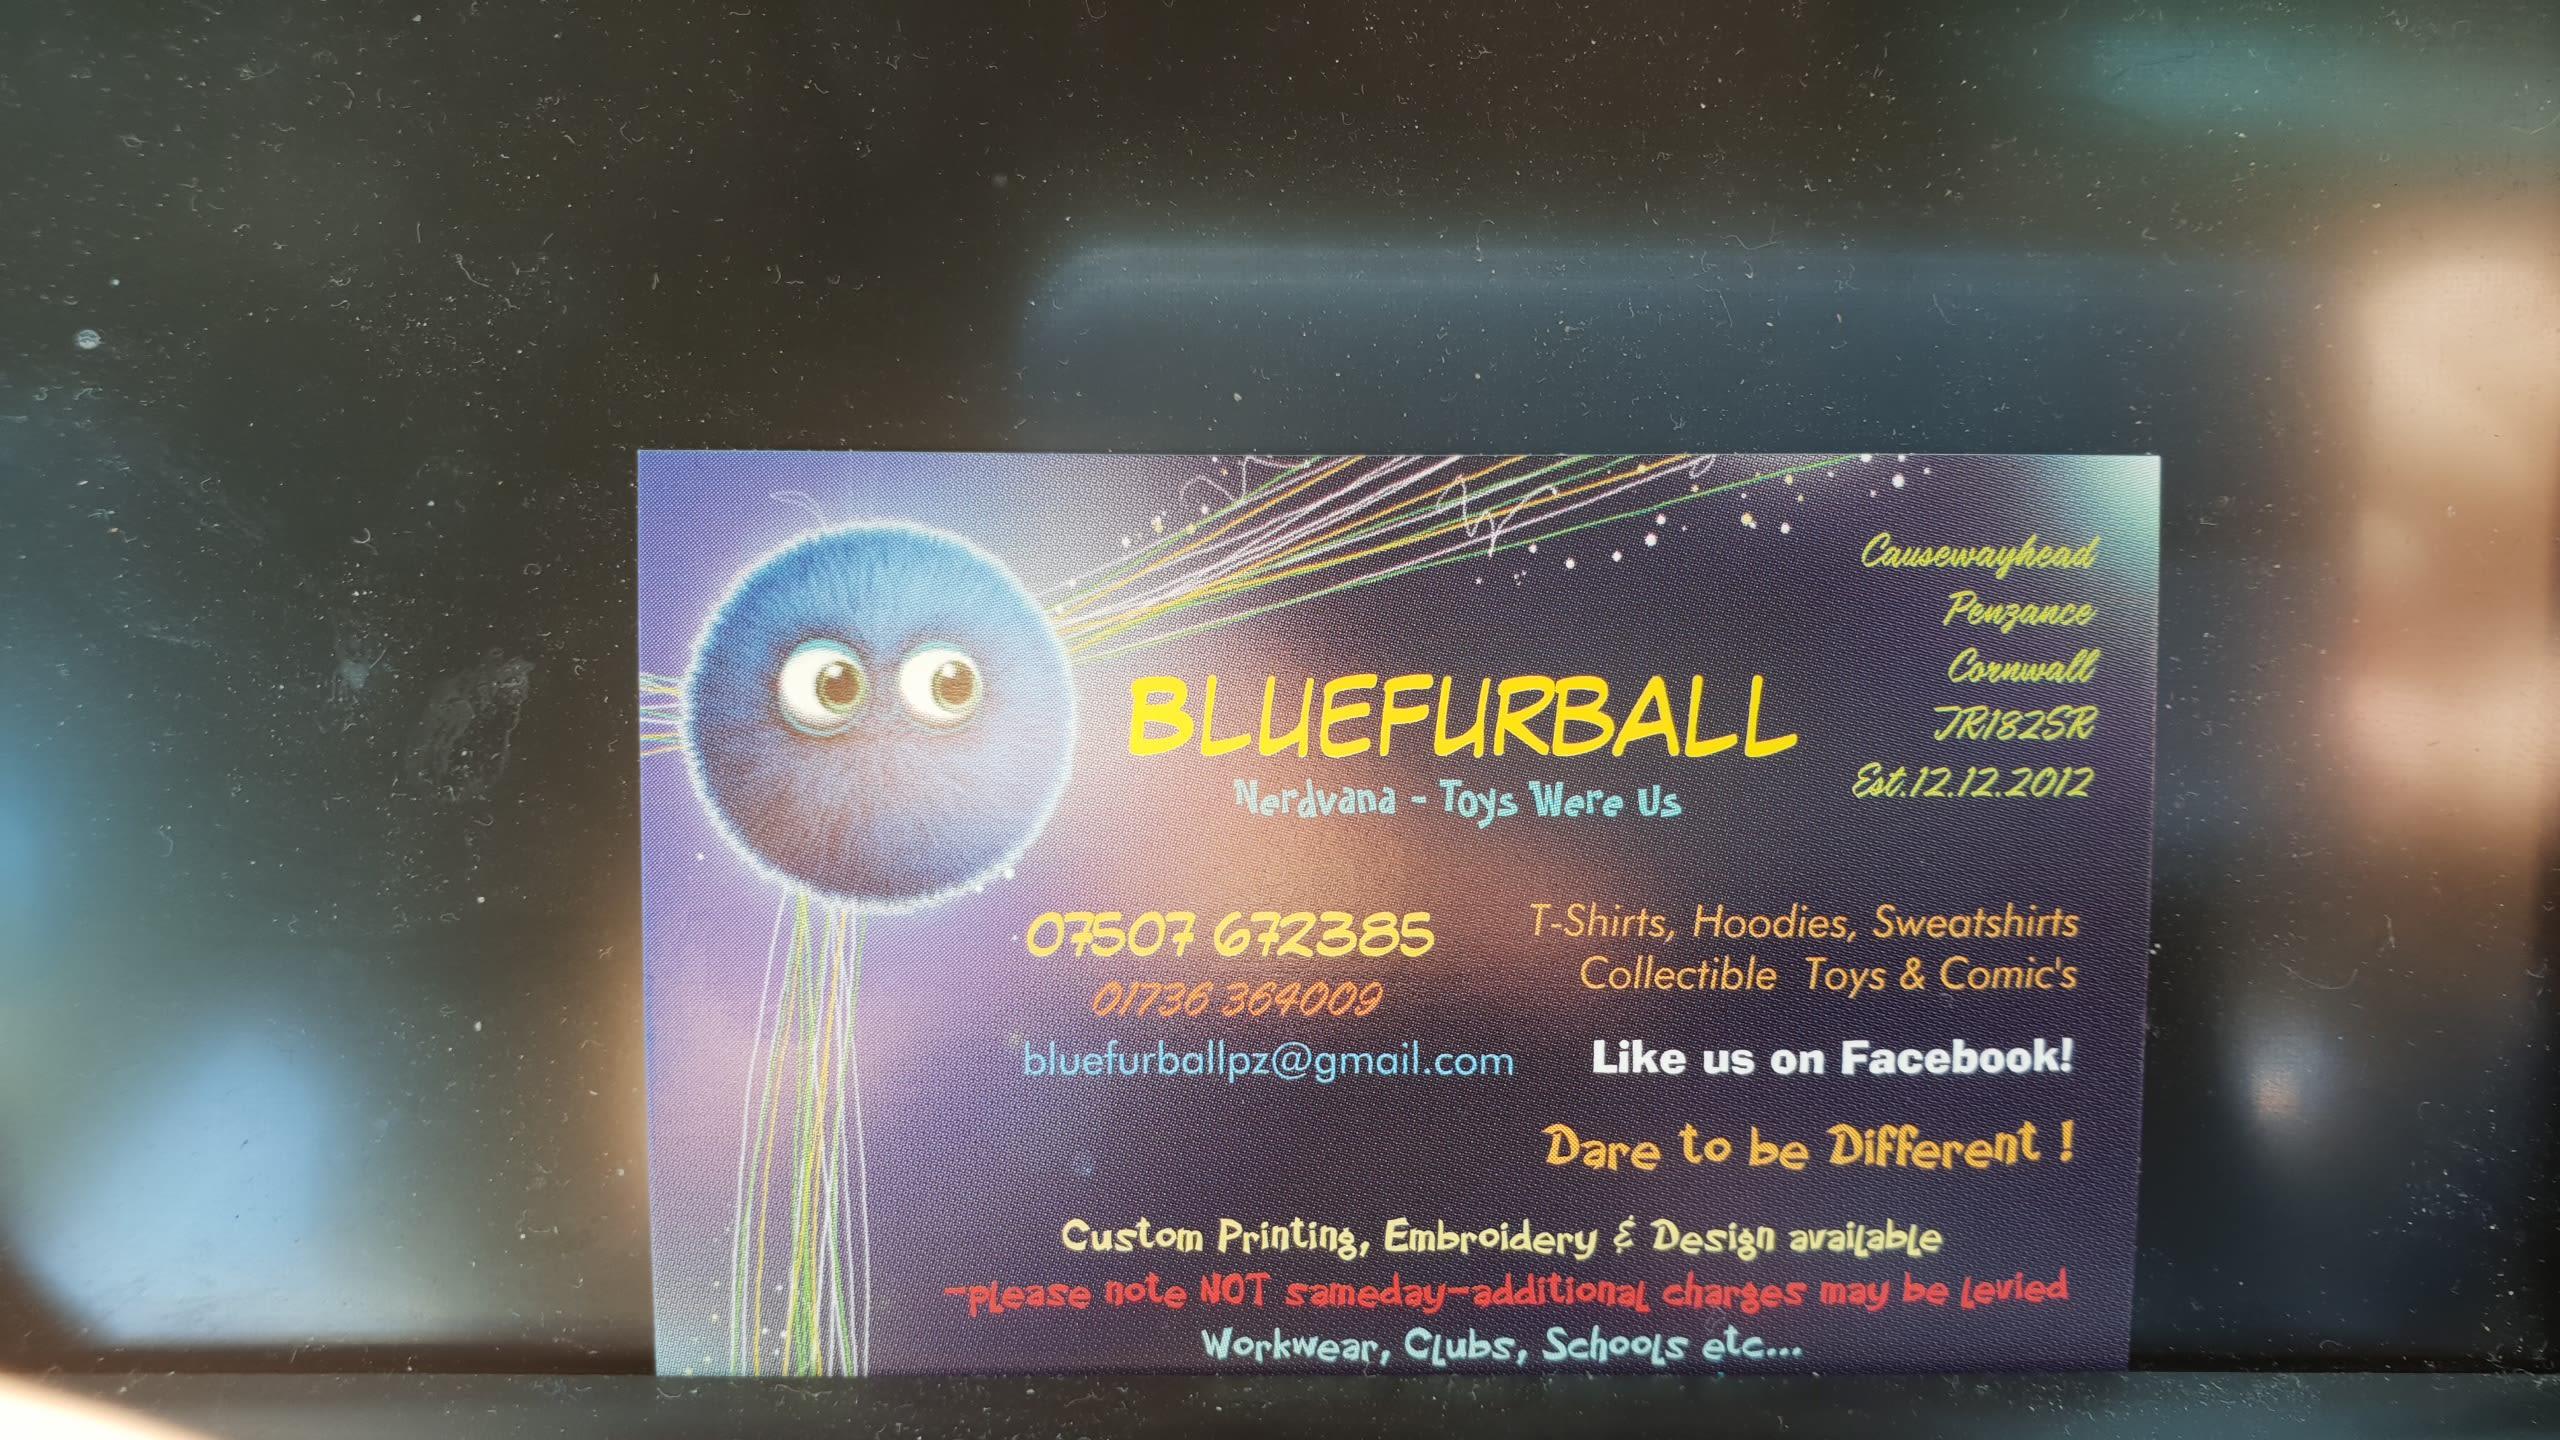 Bluefurball Limited